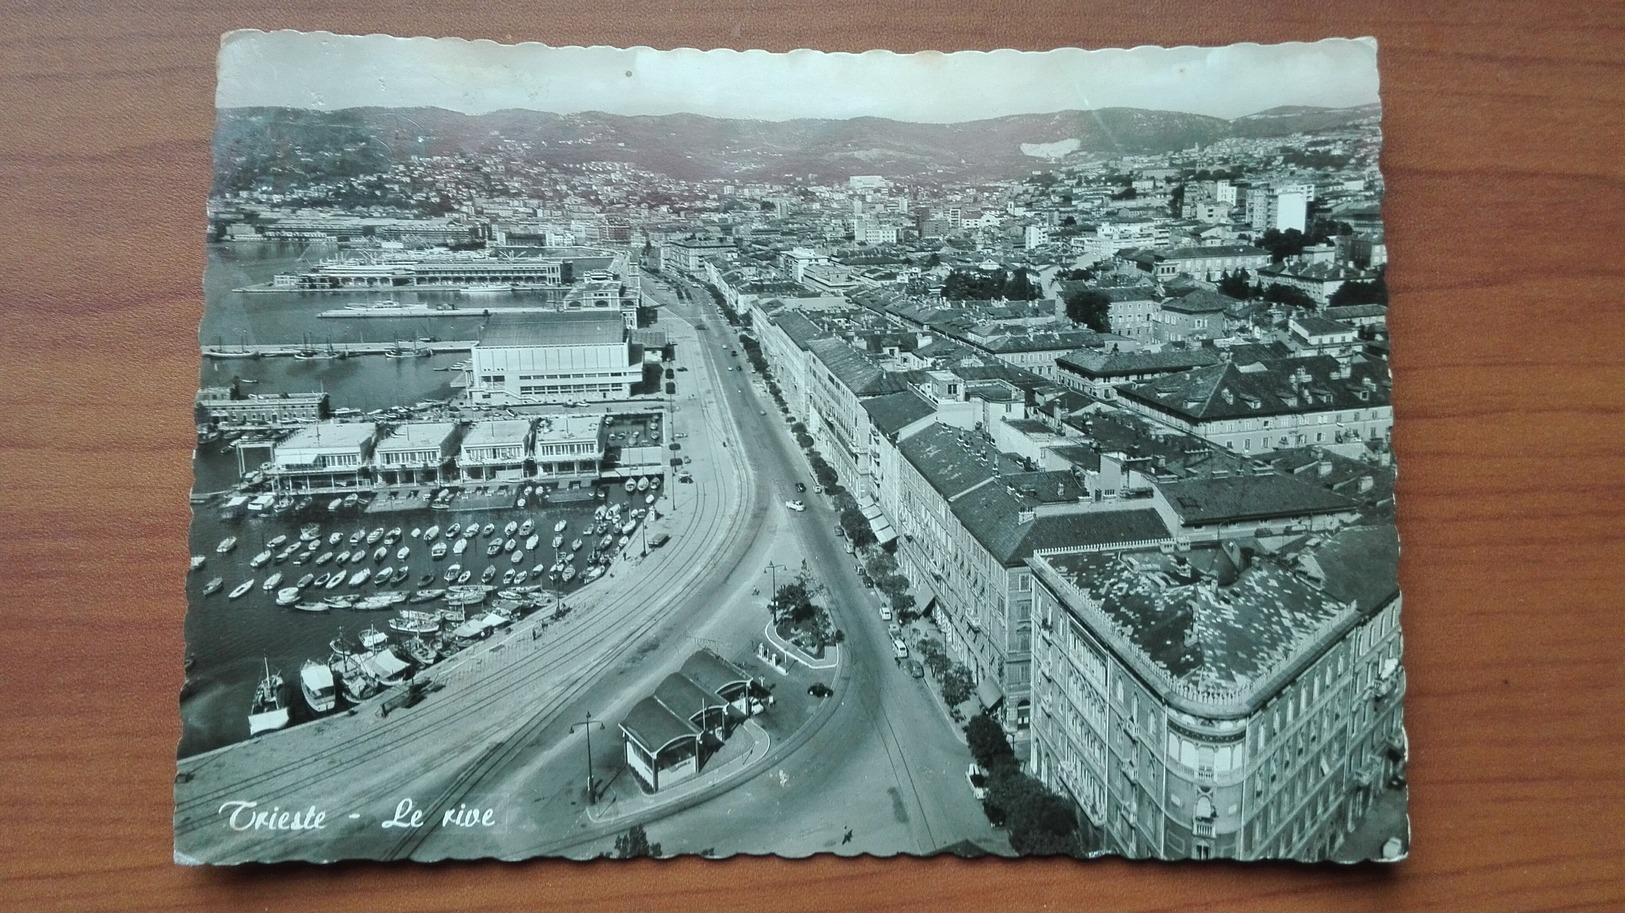 Trieste - Le Rive - Trieste